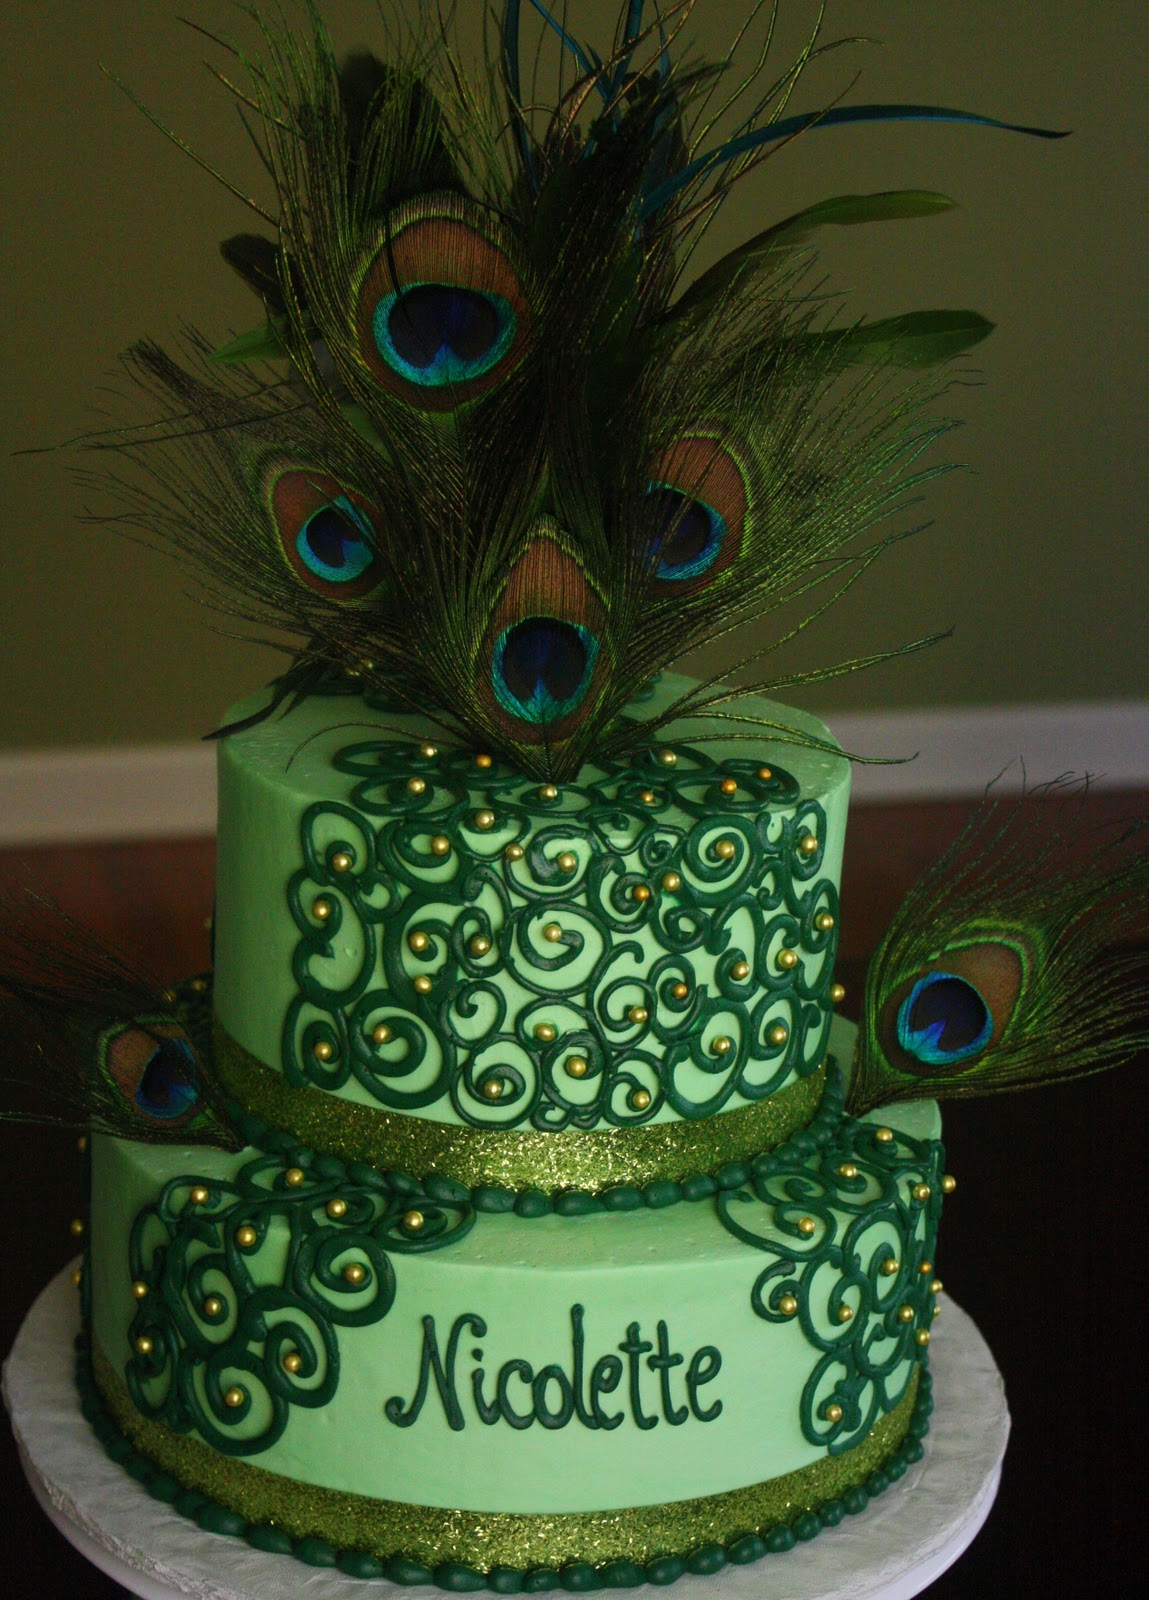 Swell Peacock Cakes Decoration Ideas Little Birthday Cakes Personalised Birthday Cards Veneteletsinfo